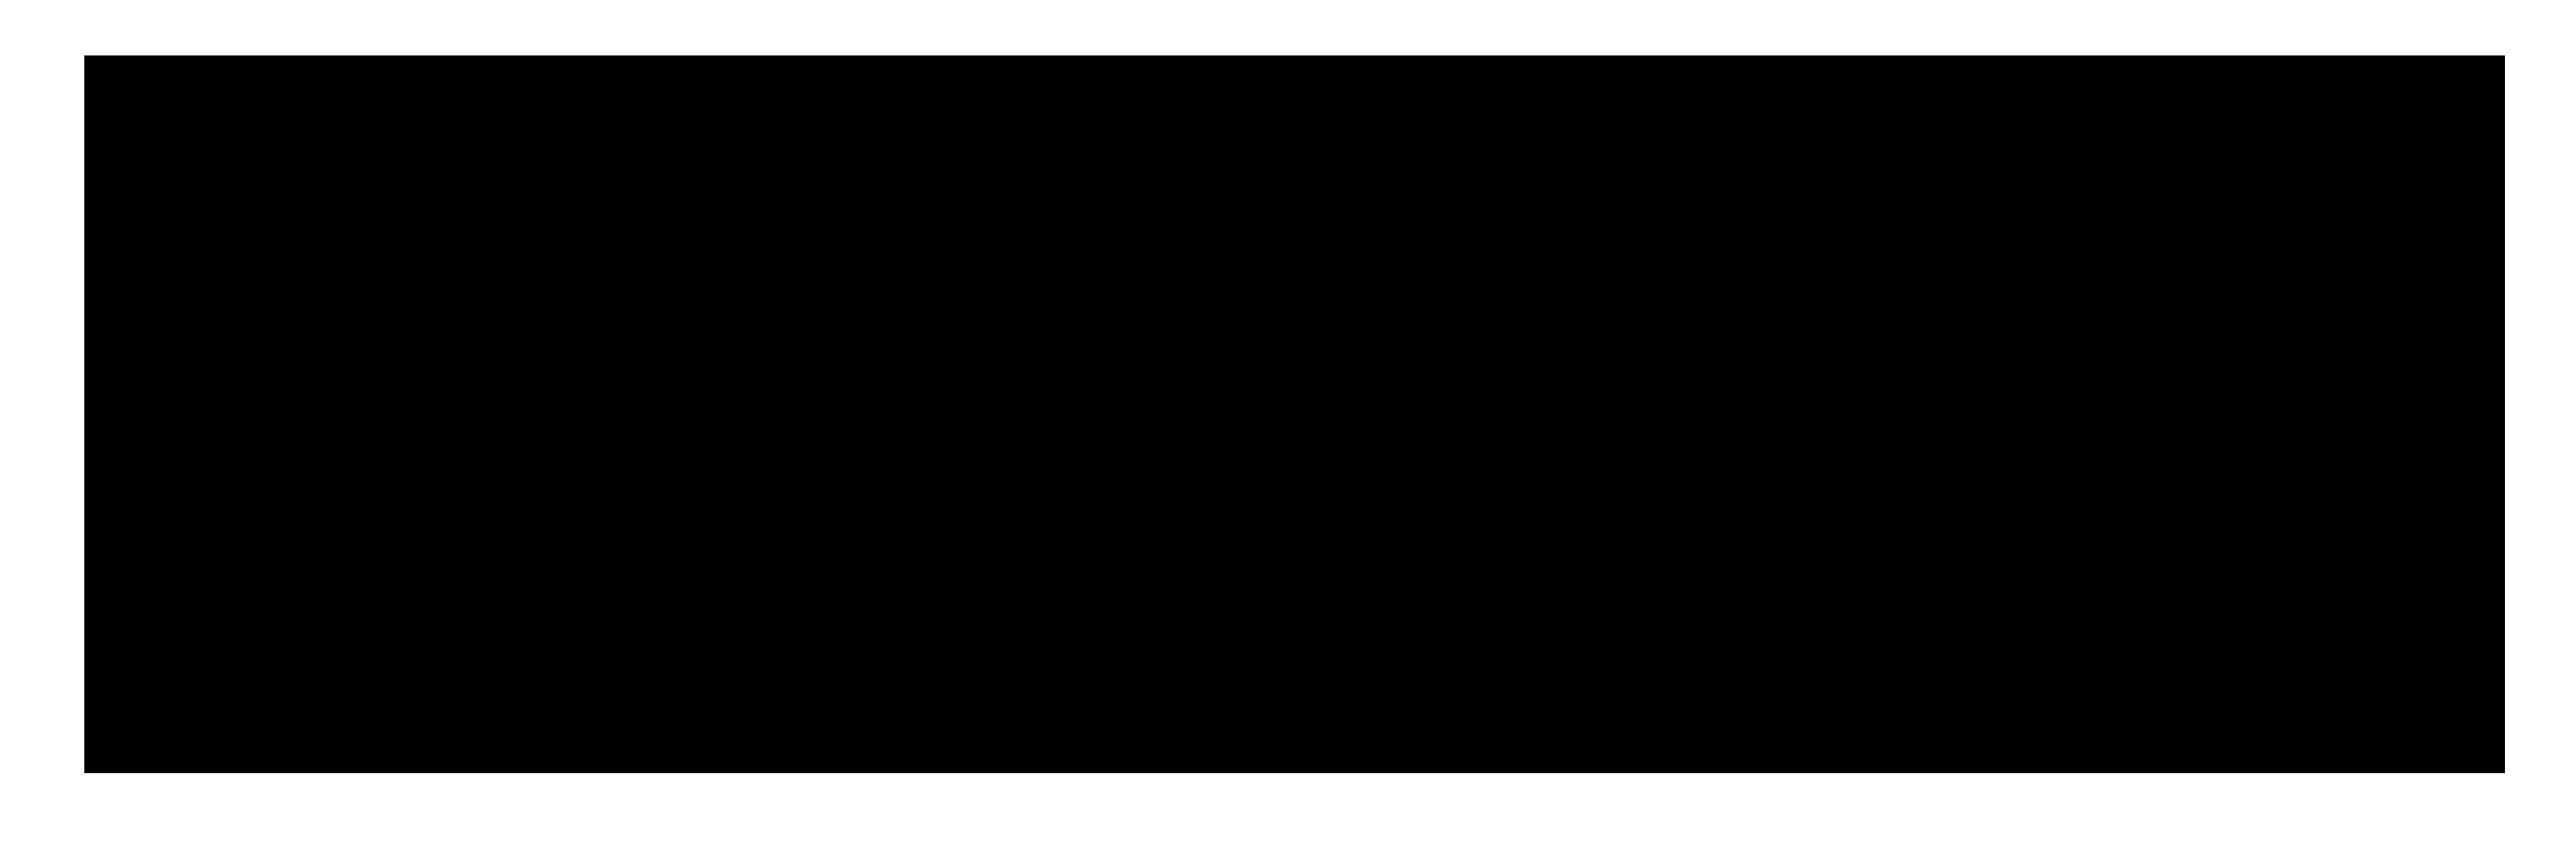 Logo Breu Straubing